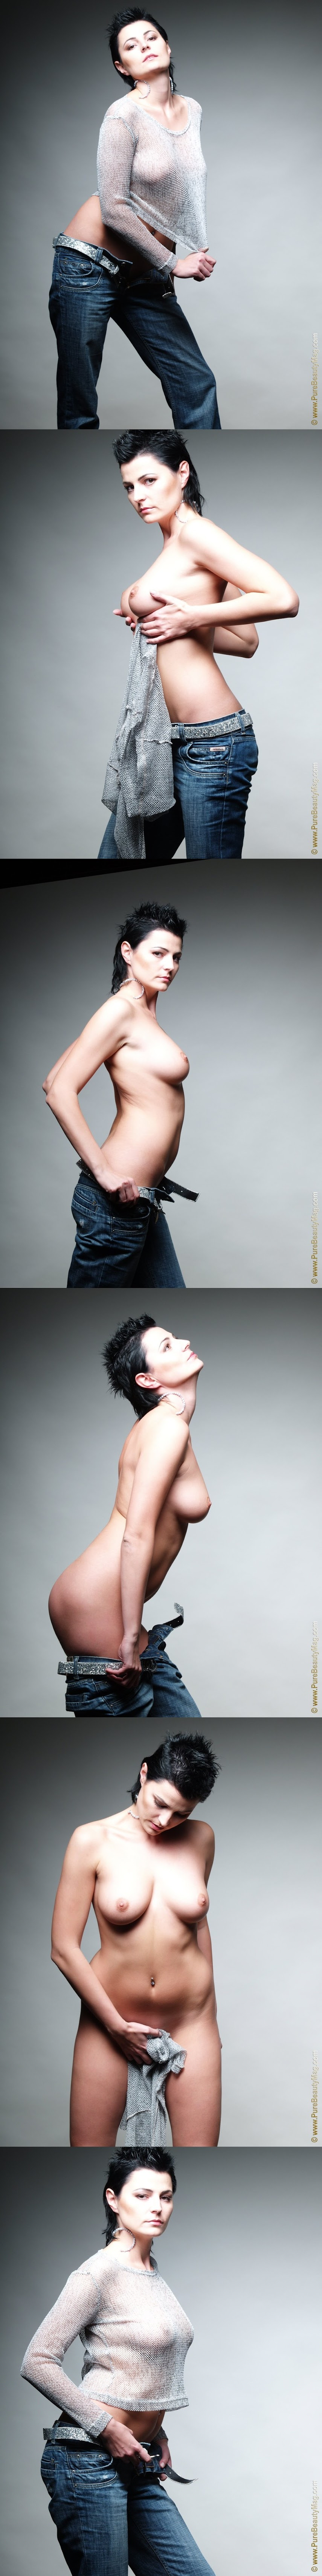 PureBeautyMag PBM  - 2005-11-20 - #s148354 - Michelle Kroczak - Blazing Hot - 2560px